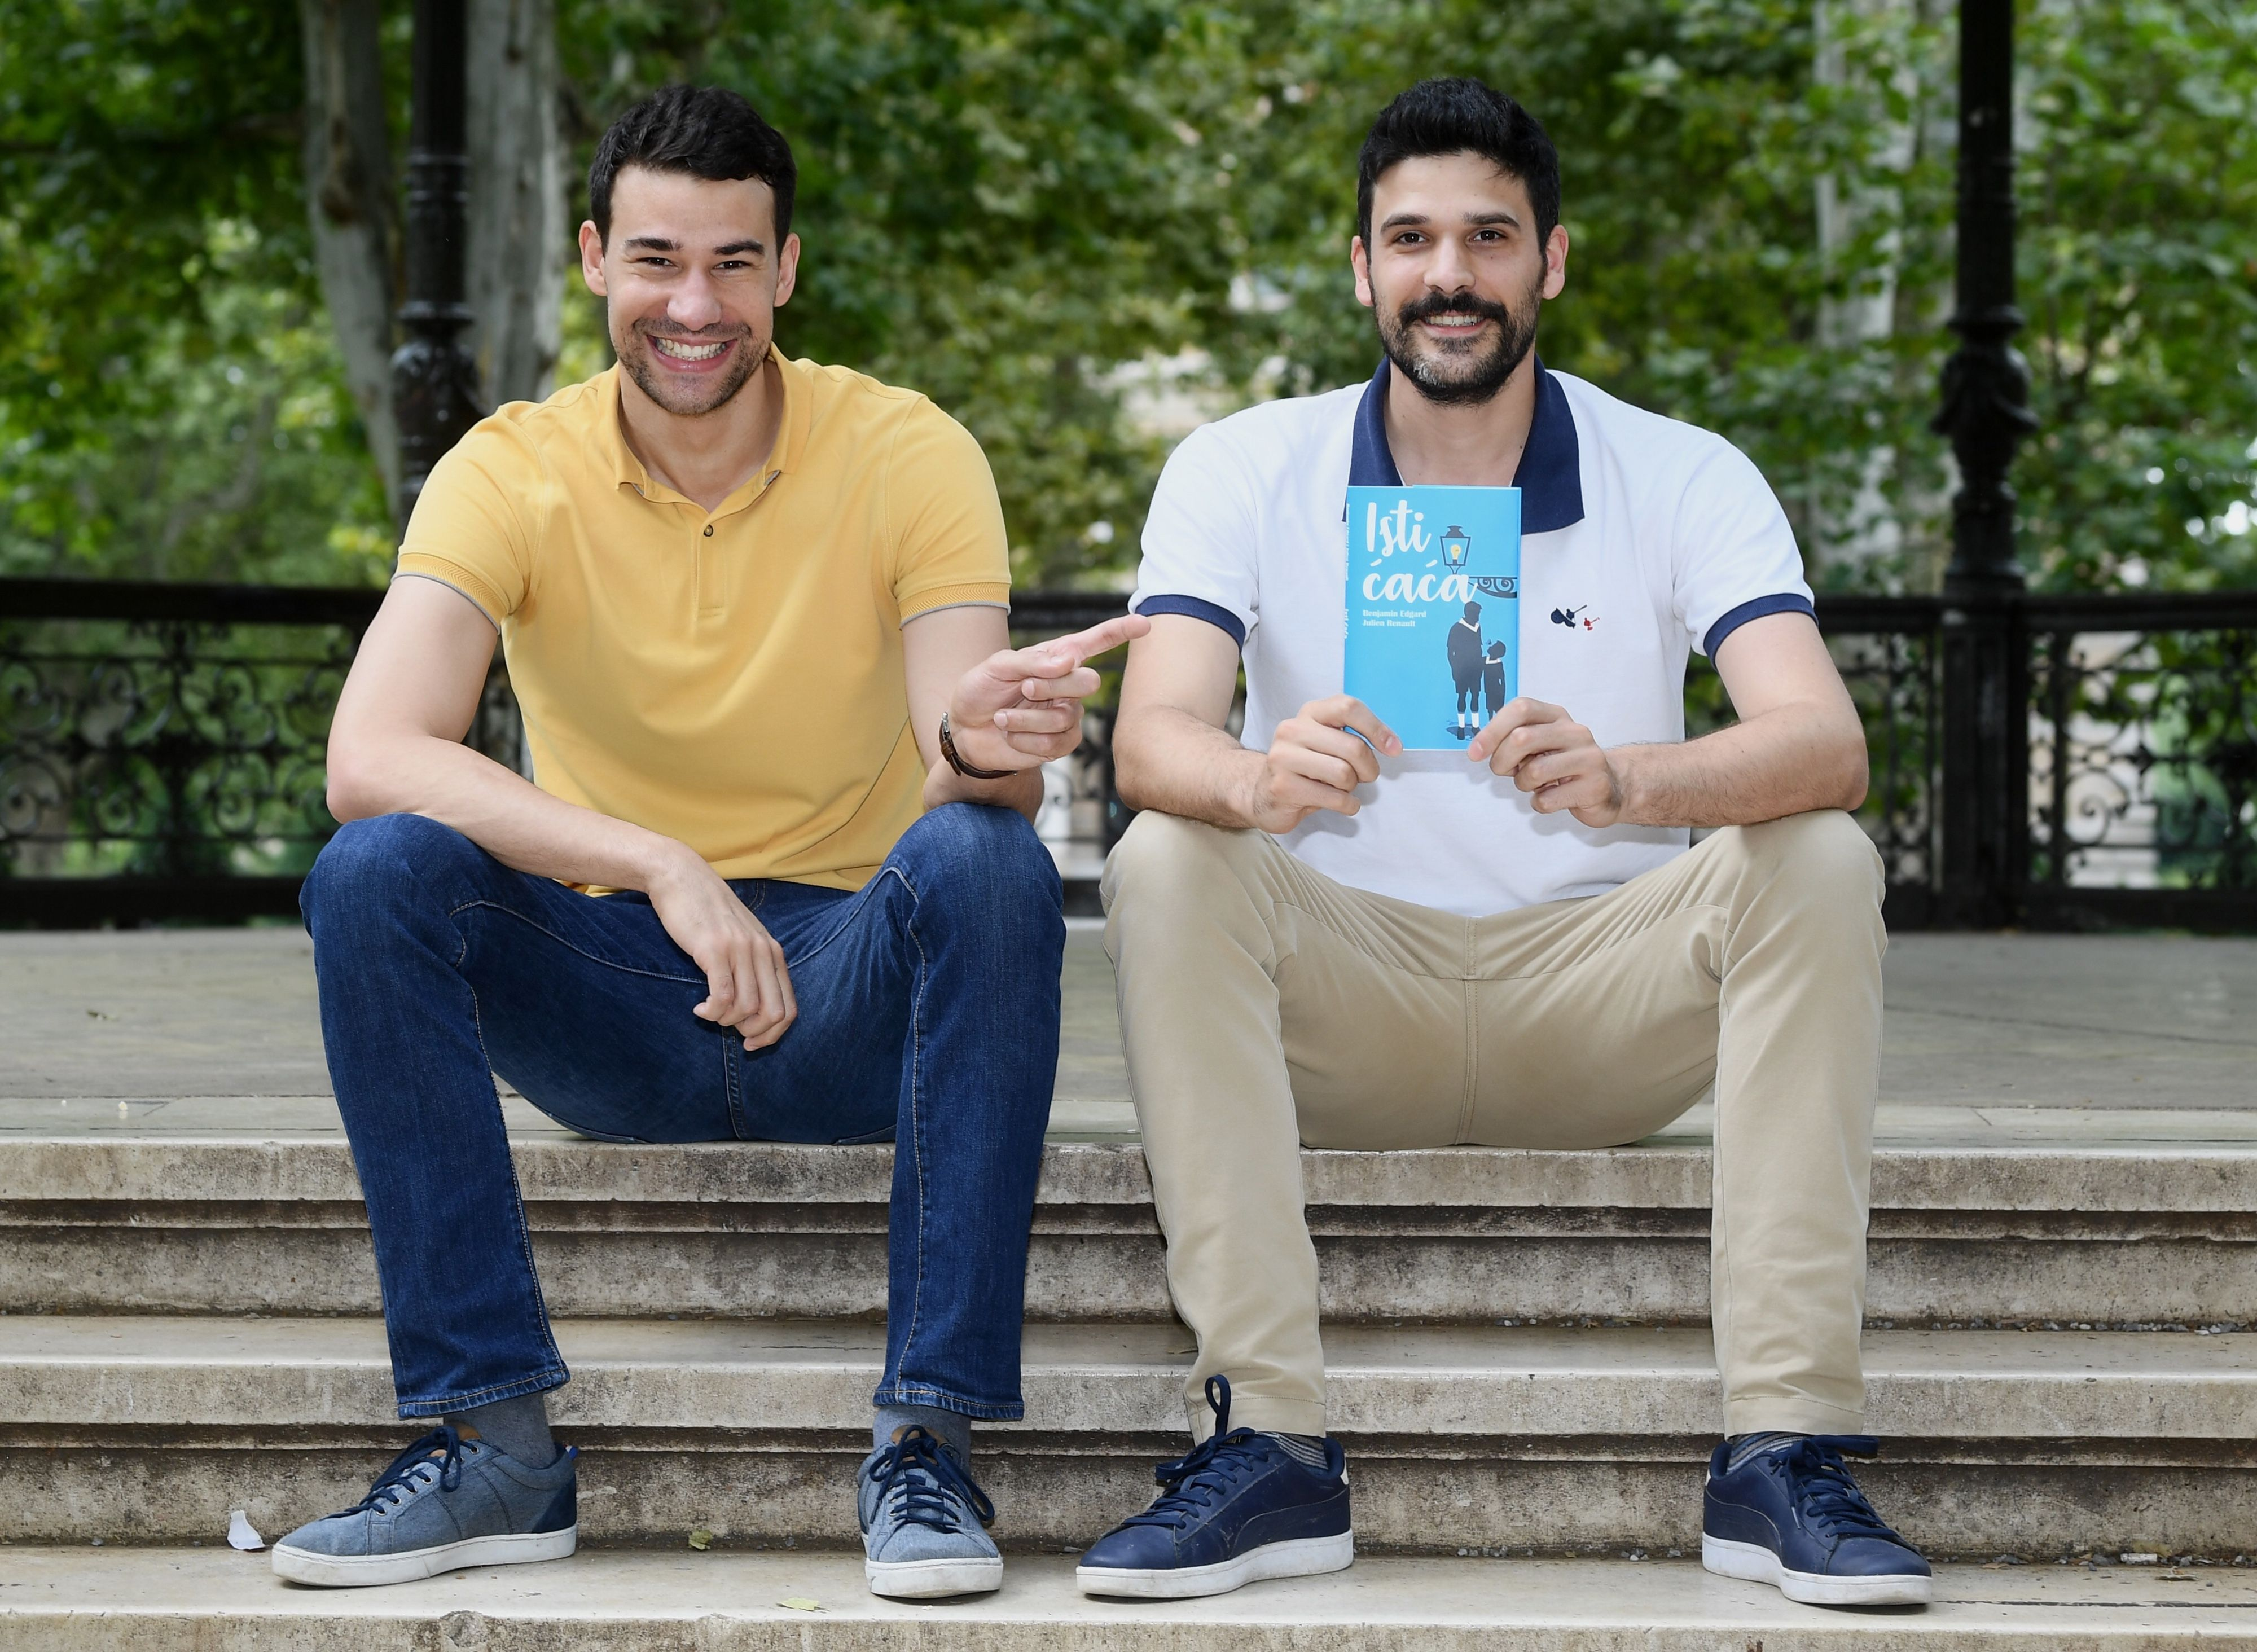 Benjamin Edgard i Julien Renault Pariz su zamijenili Zagrebom, a nedavno objavili i knjigu na hrvatskom